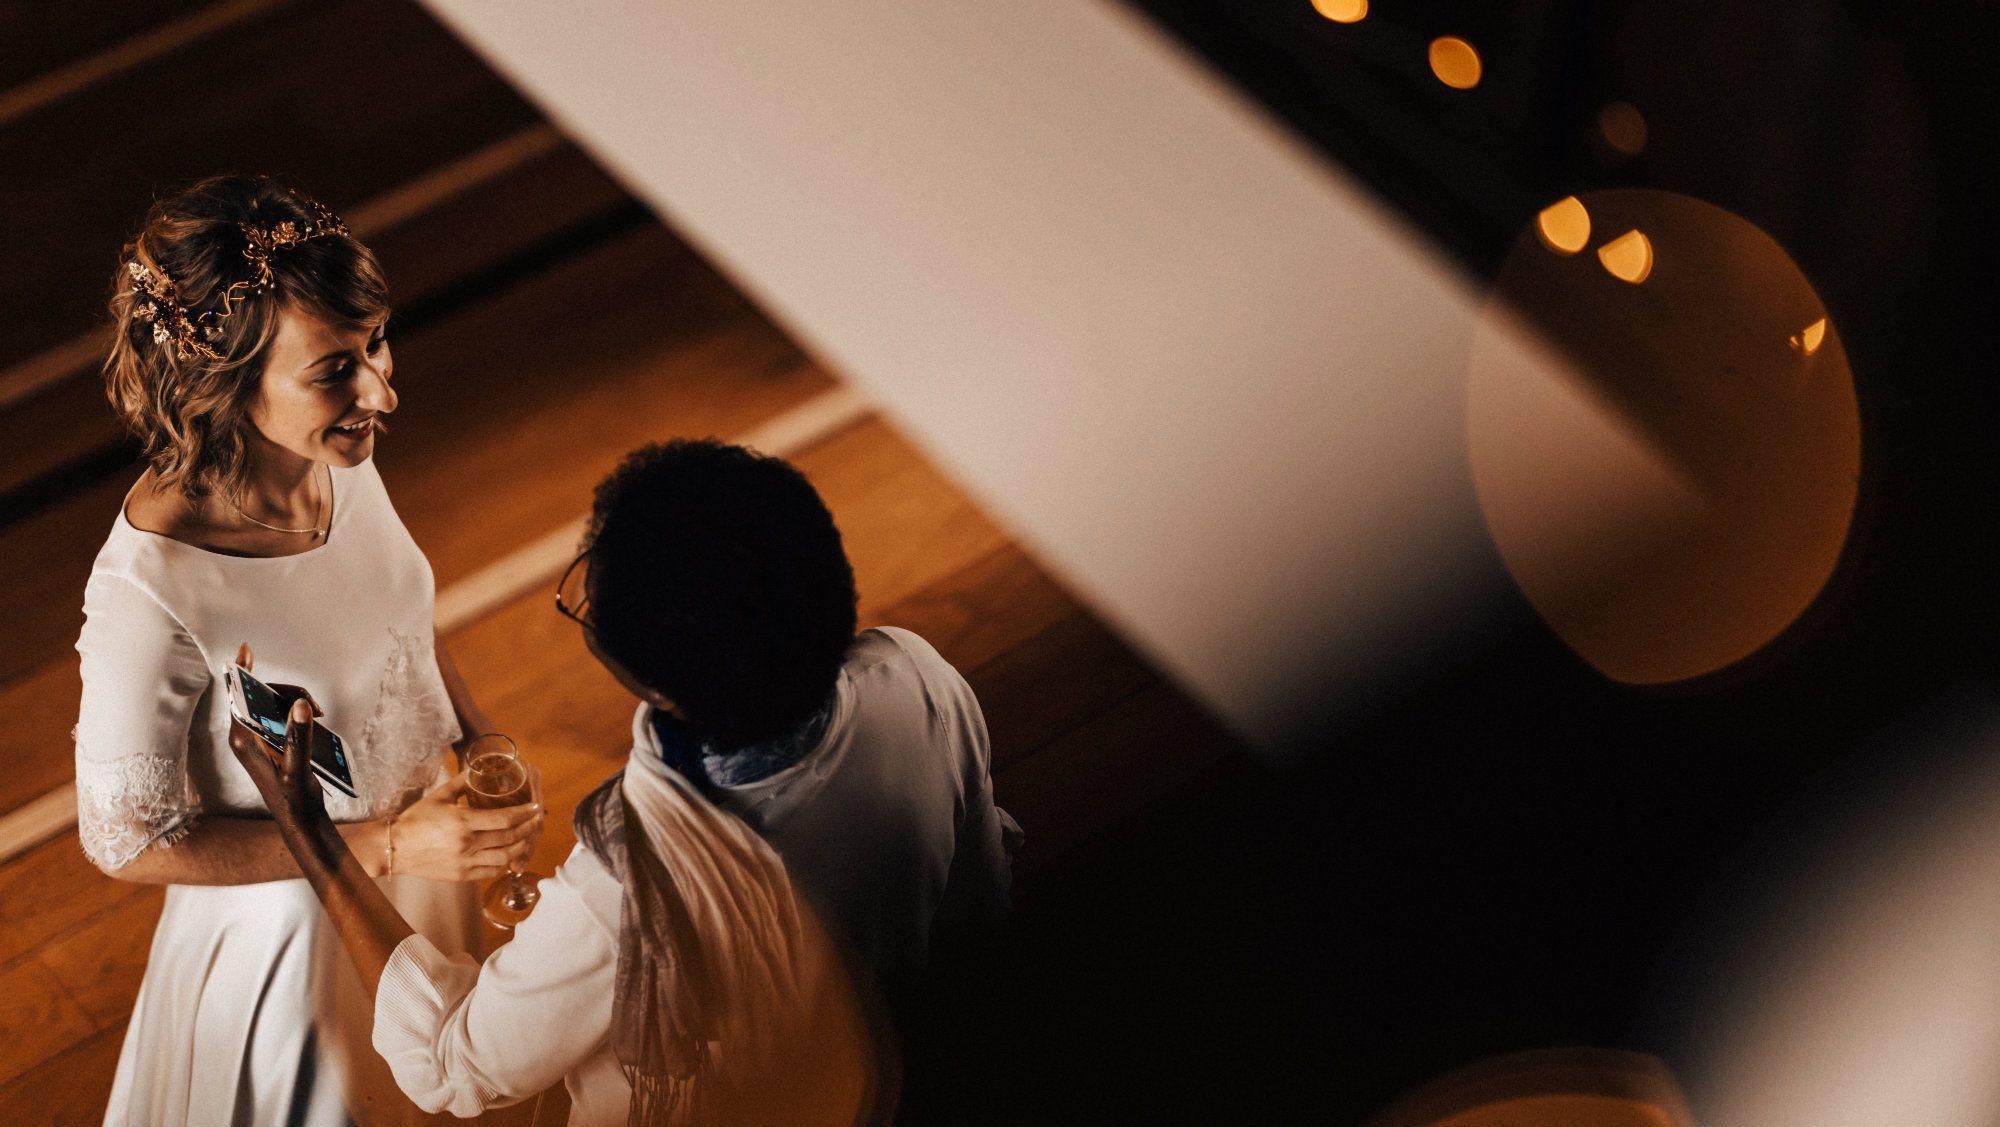 Bridal-wedding-occasion-hair-accessories-UK-gold-leaf-SRA-76.3